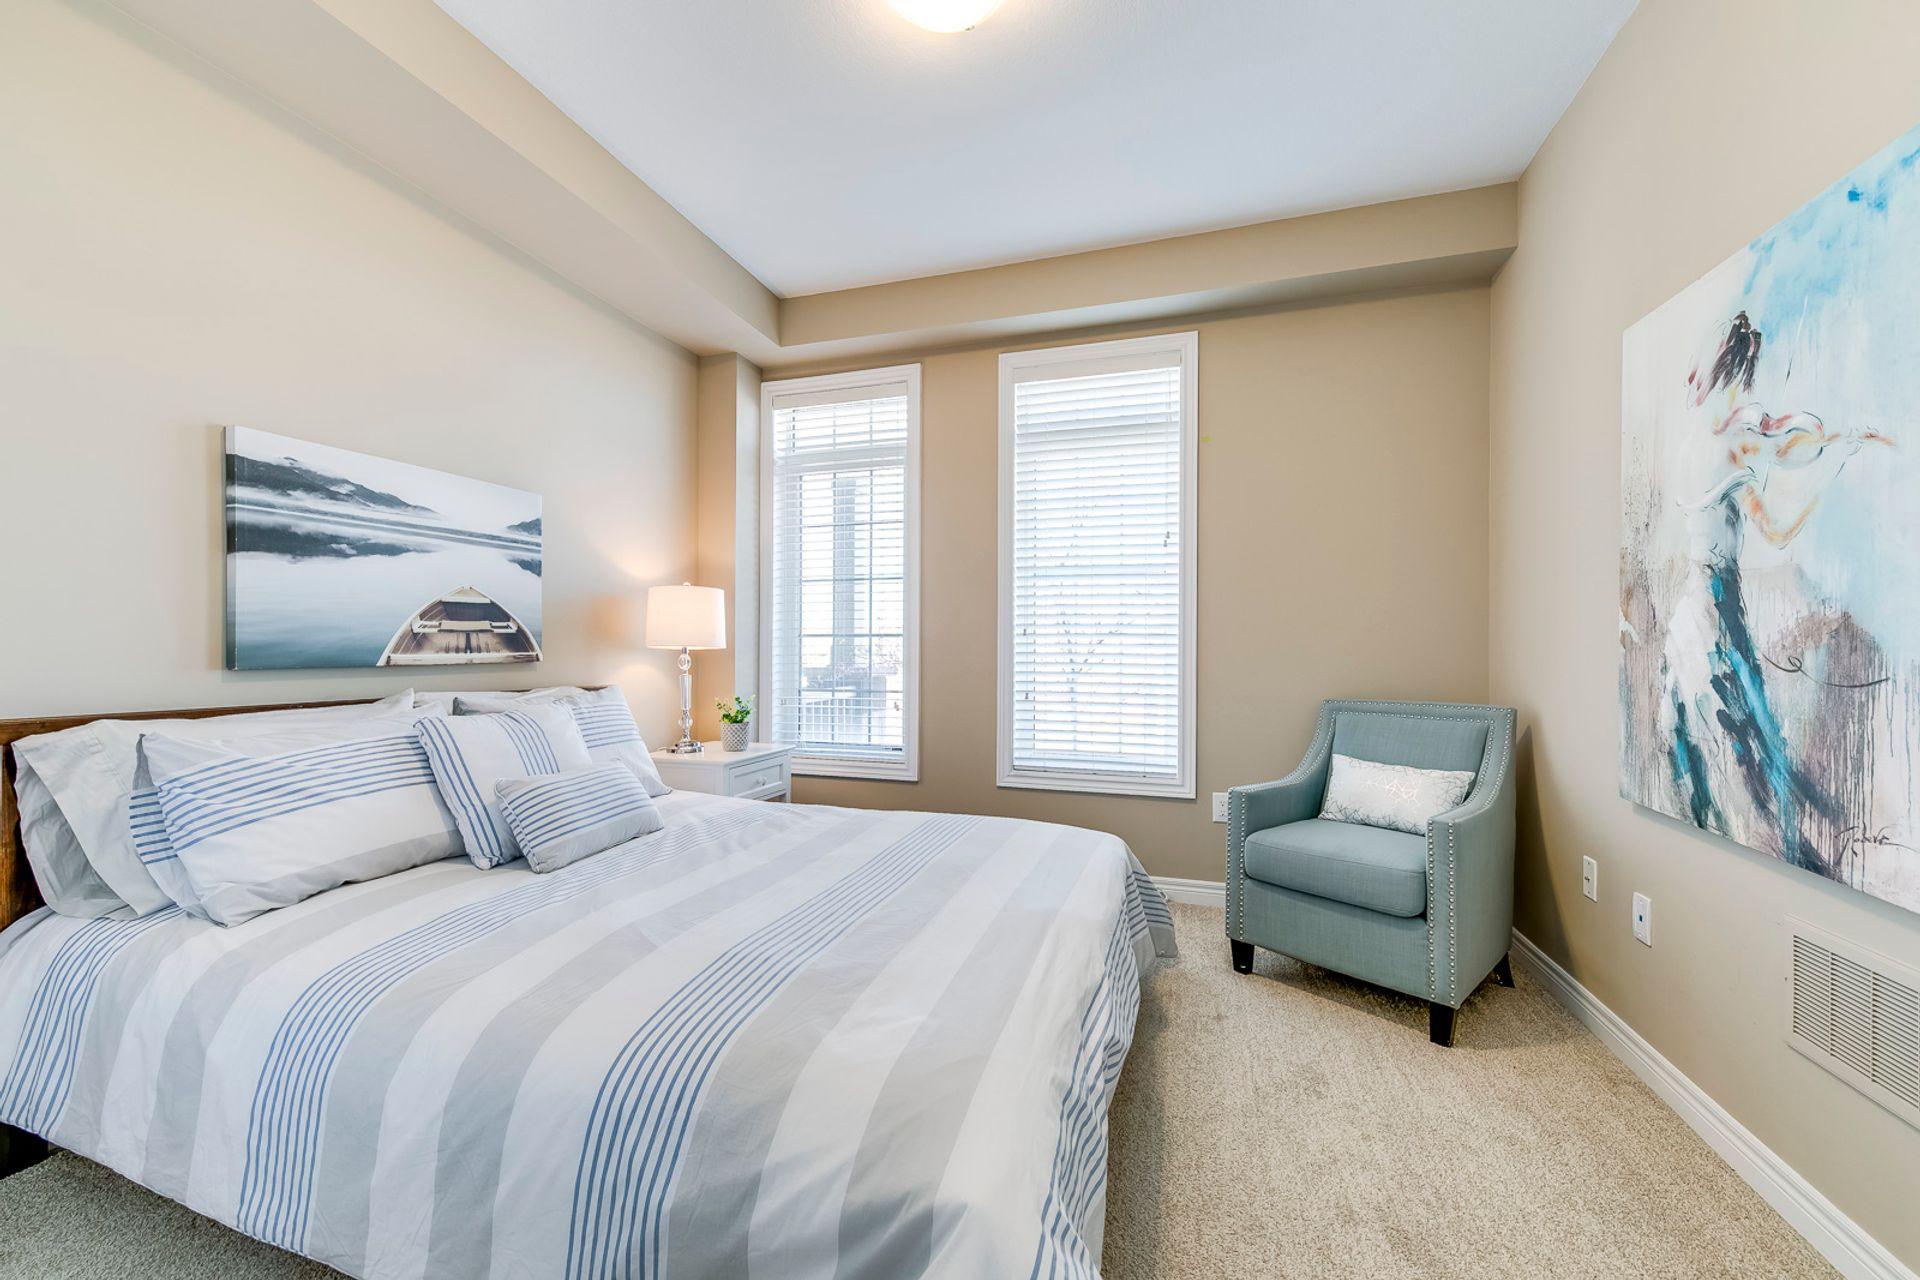 Guest Bedroom - 11 - 3026 Postridge Dr, Oakville - Elite3 & Team at 11 - 3026 Postridge Drive, Rural Oakville, Oakville